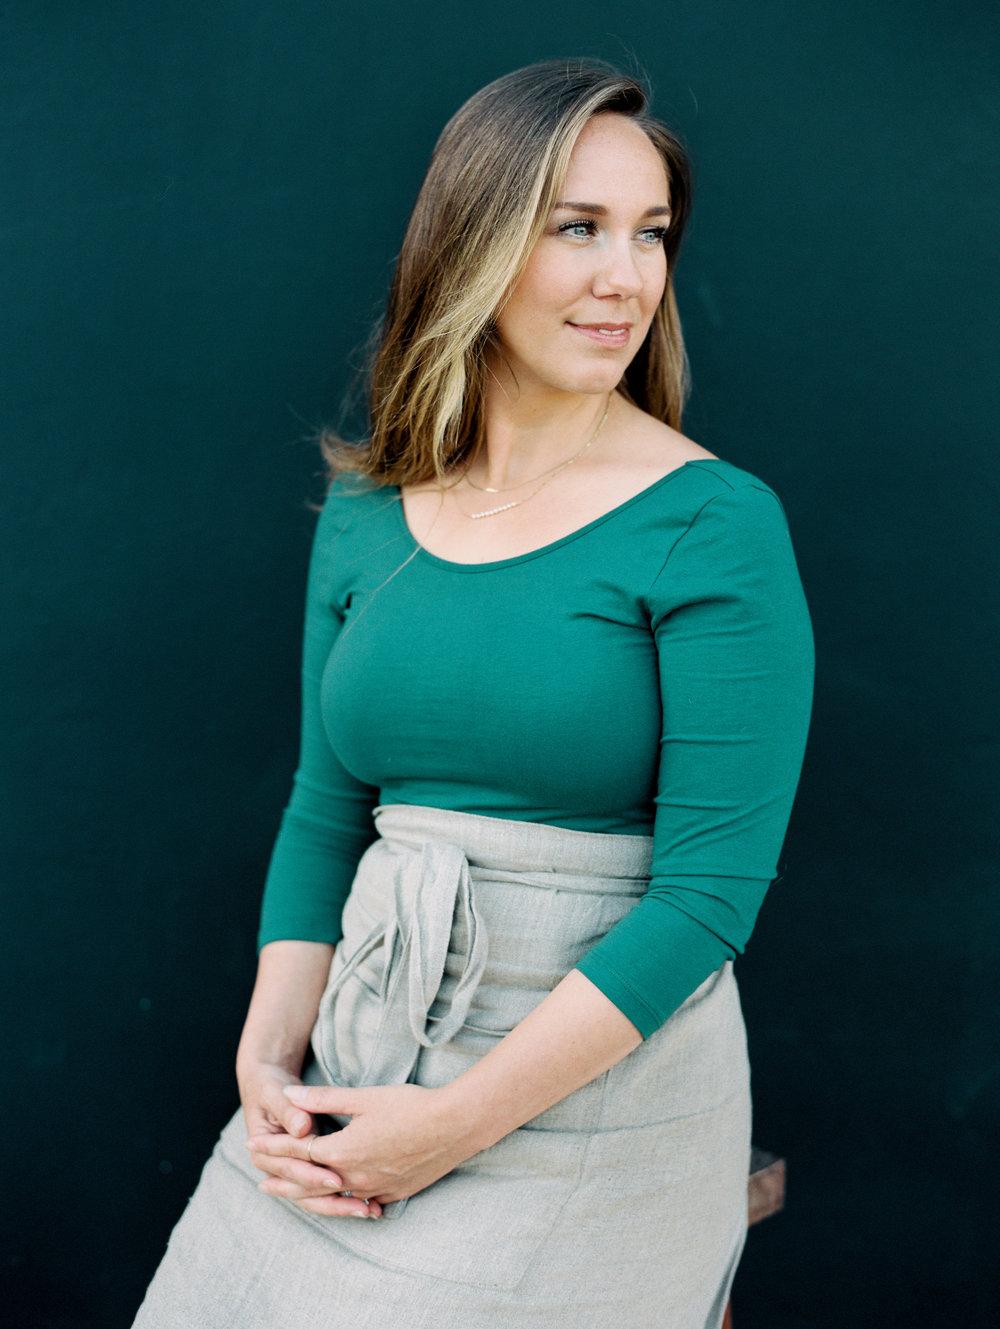 Asha Renew Designer. Stylist. Tastemaker. Central Coast, California